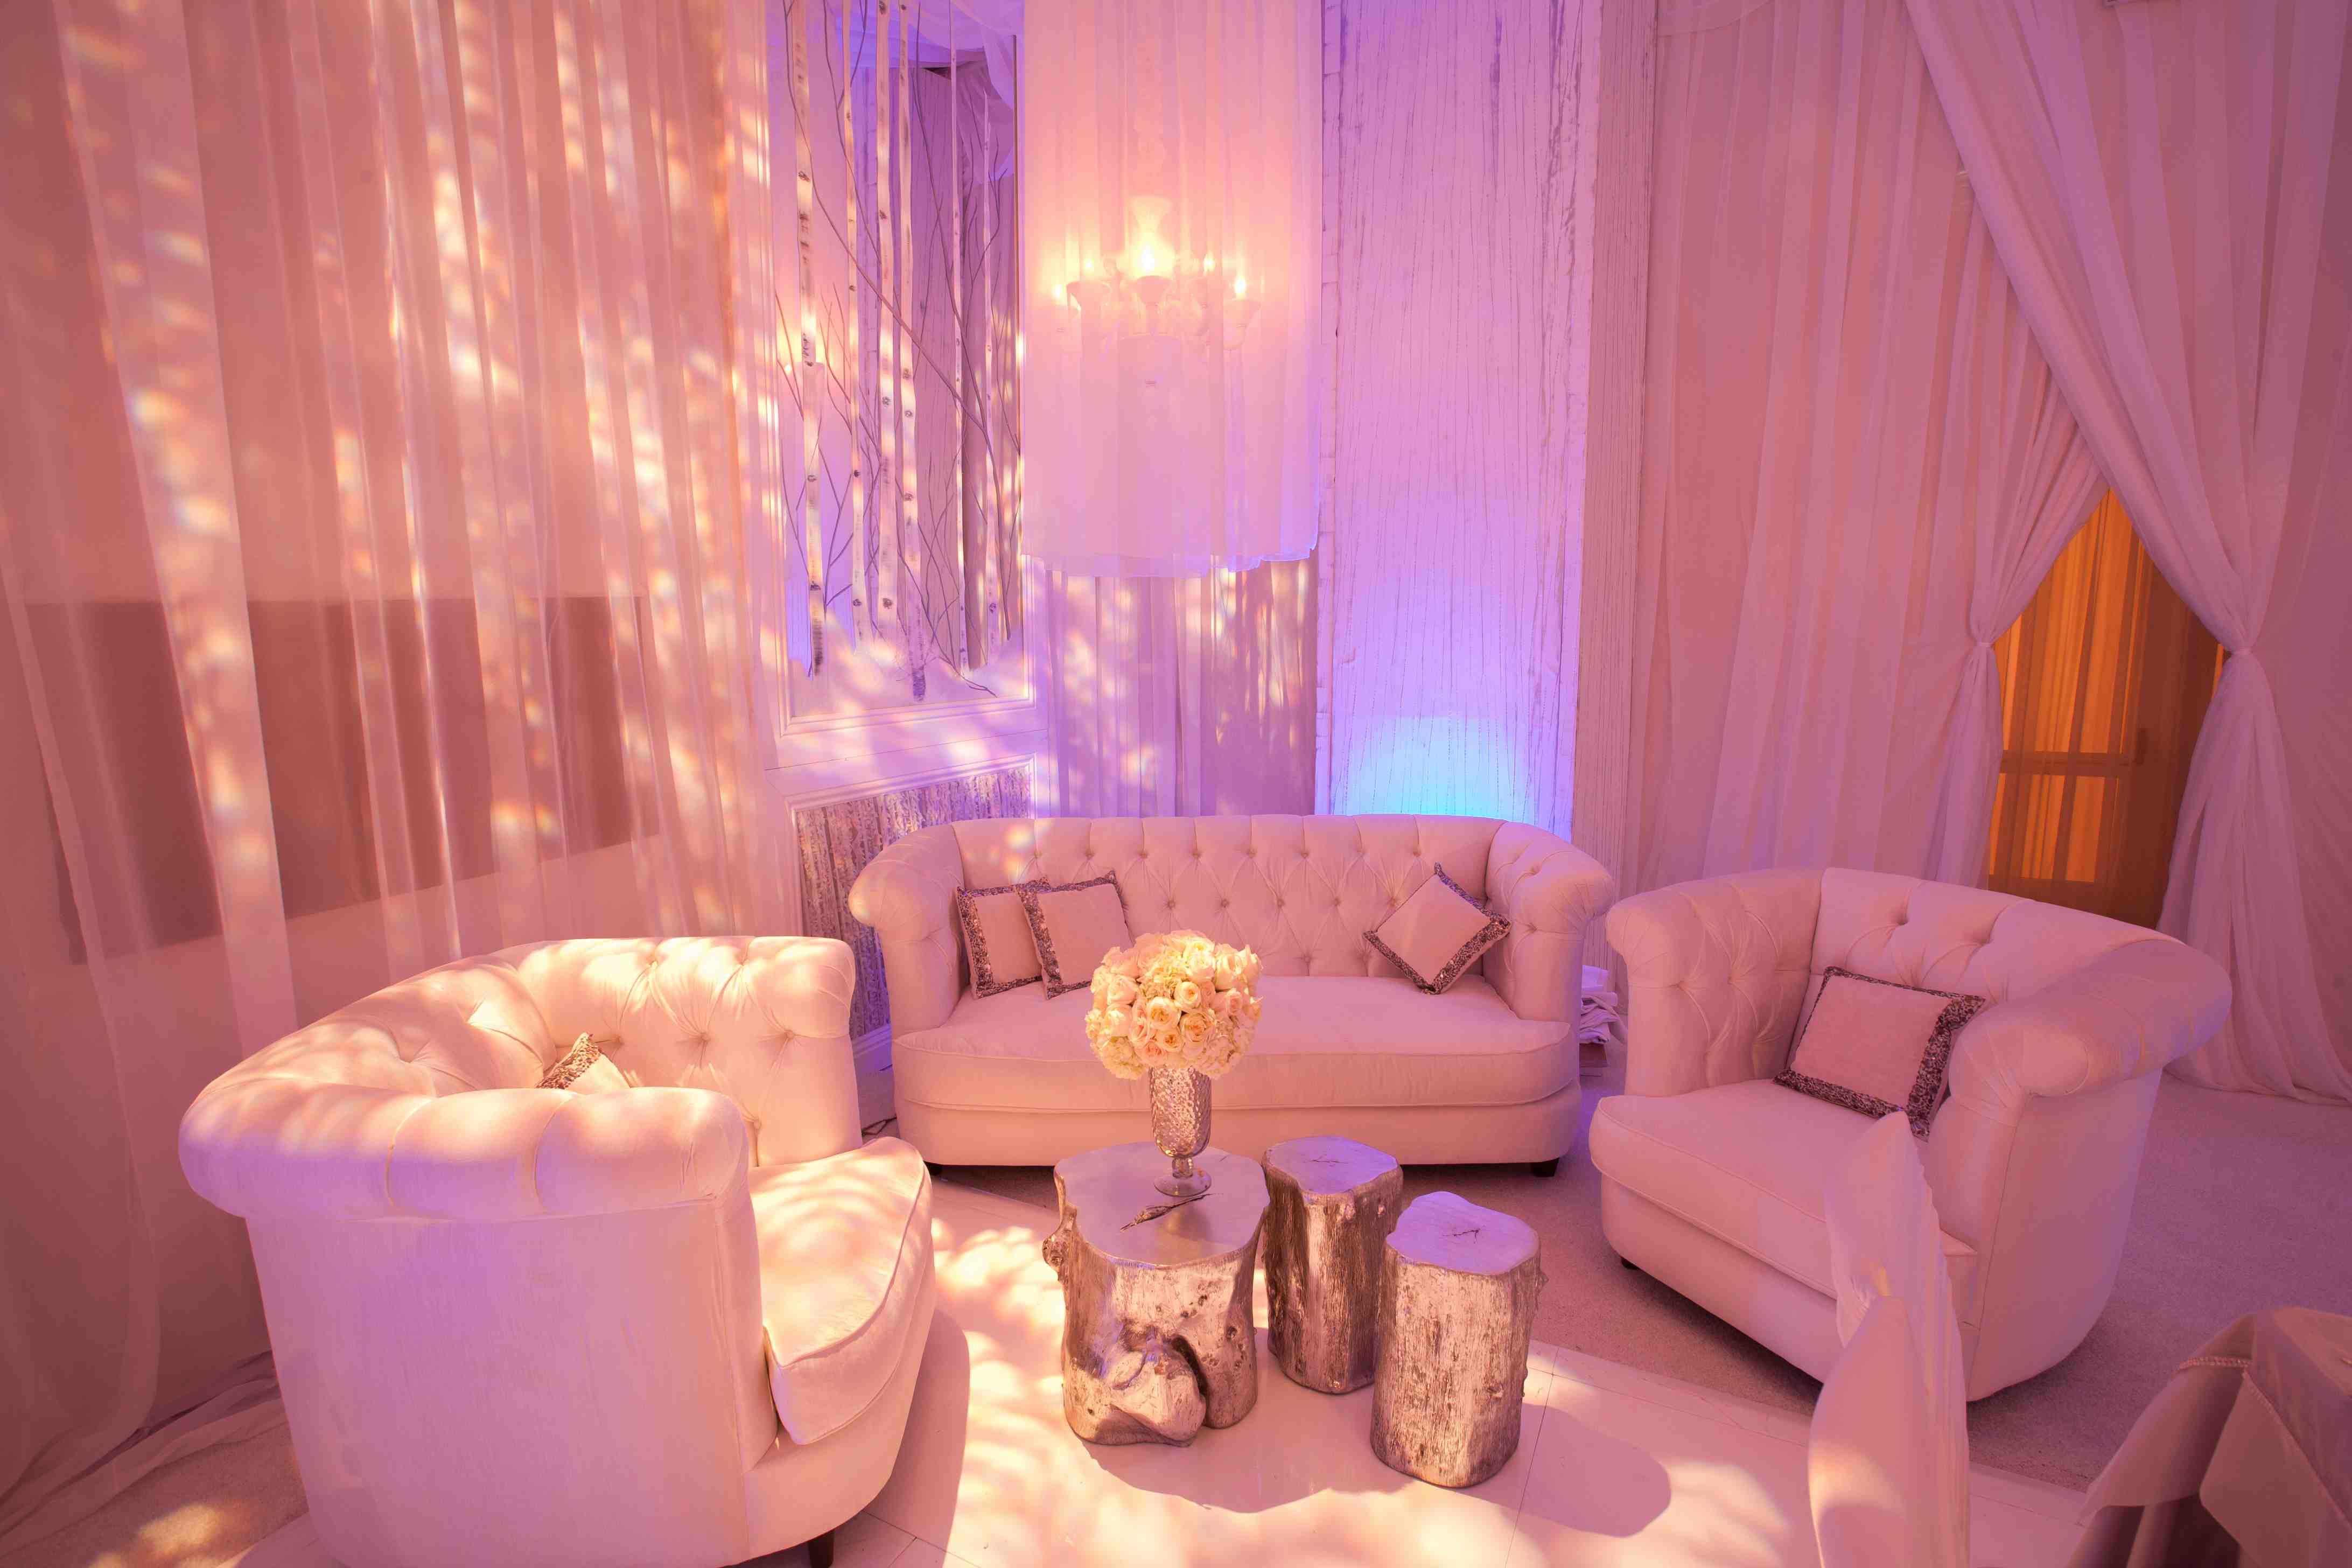 Wedding lounge area with pink lighting